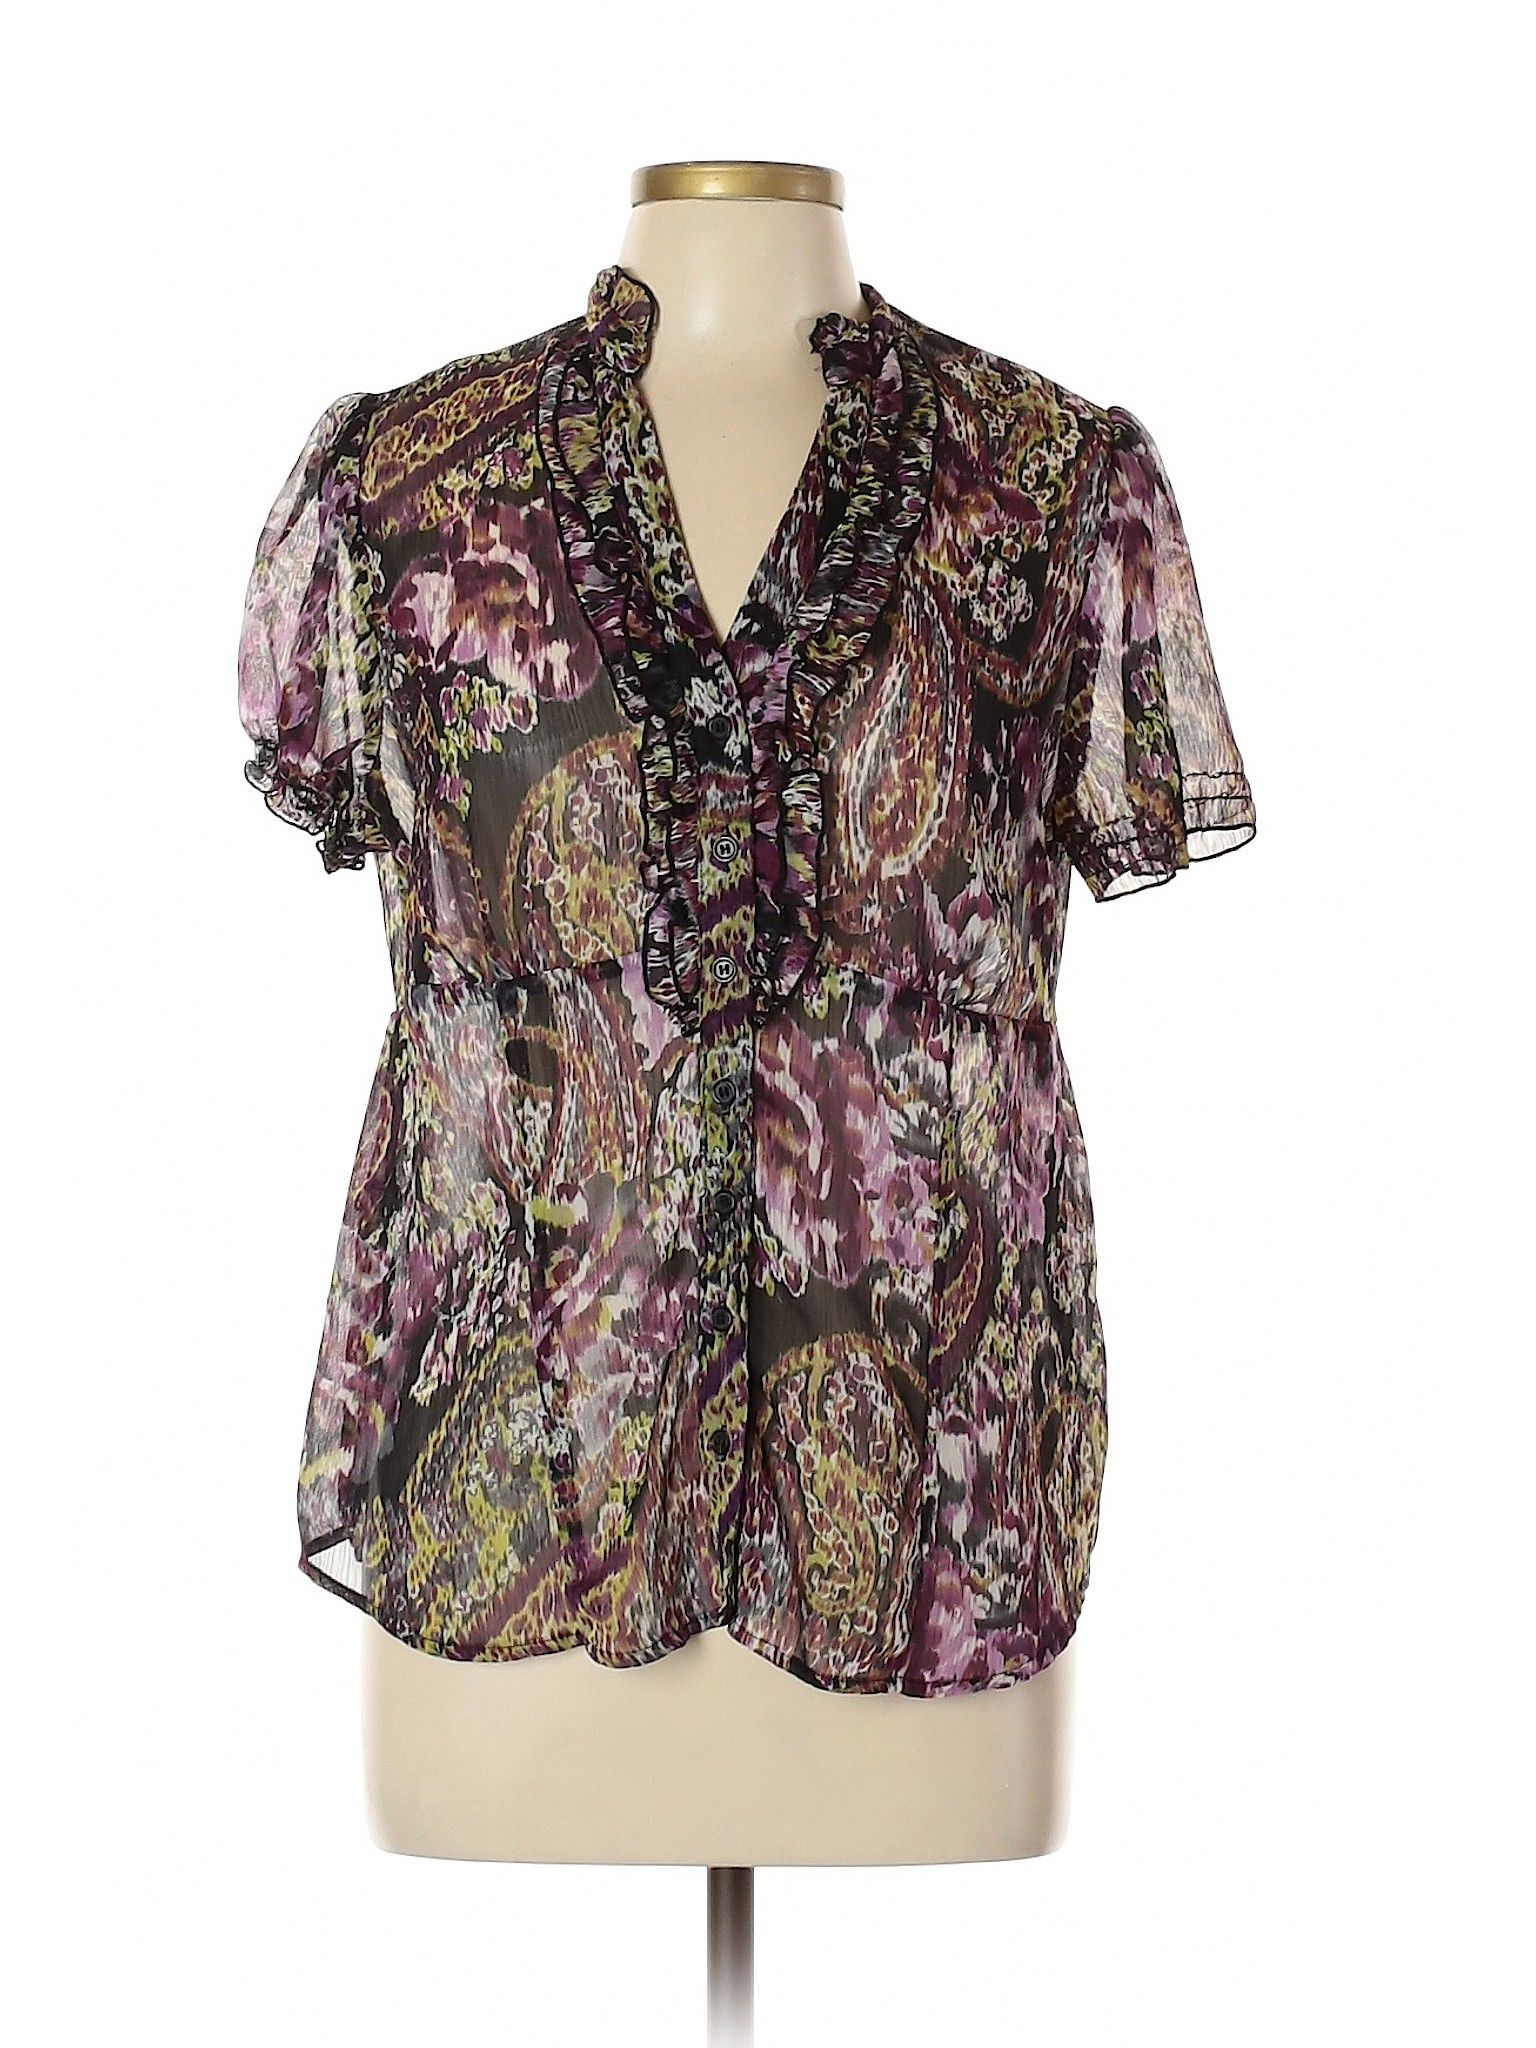 I N Studio Short Sleeve Blouse Purple Print V Neck Women S Tops Size X Large Clothes